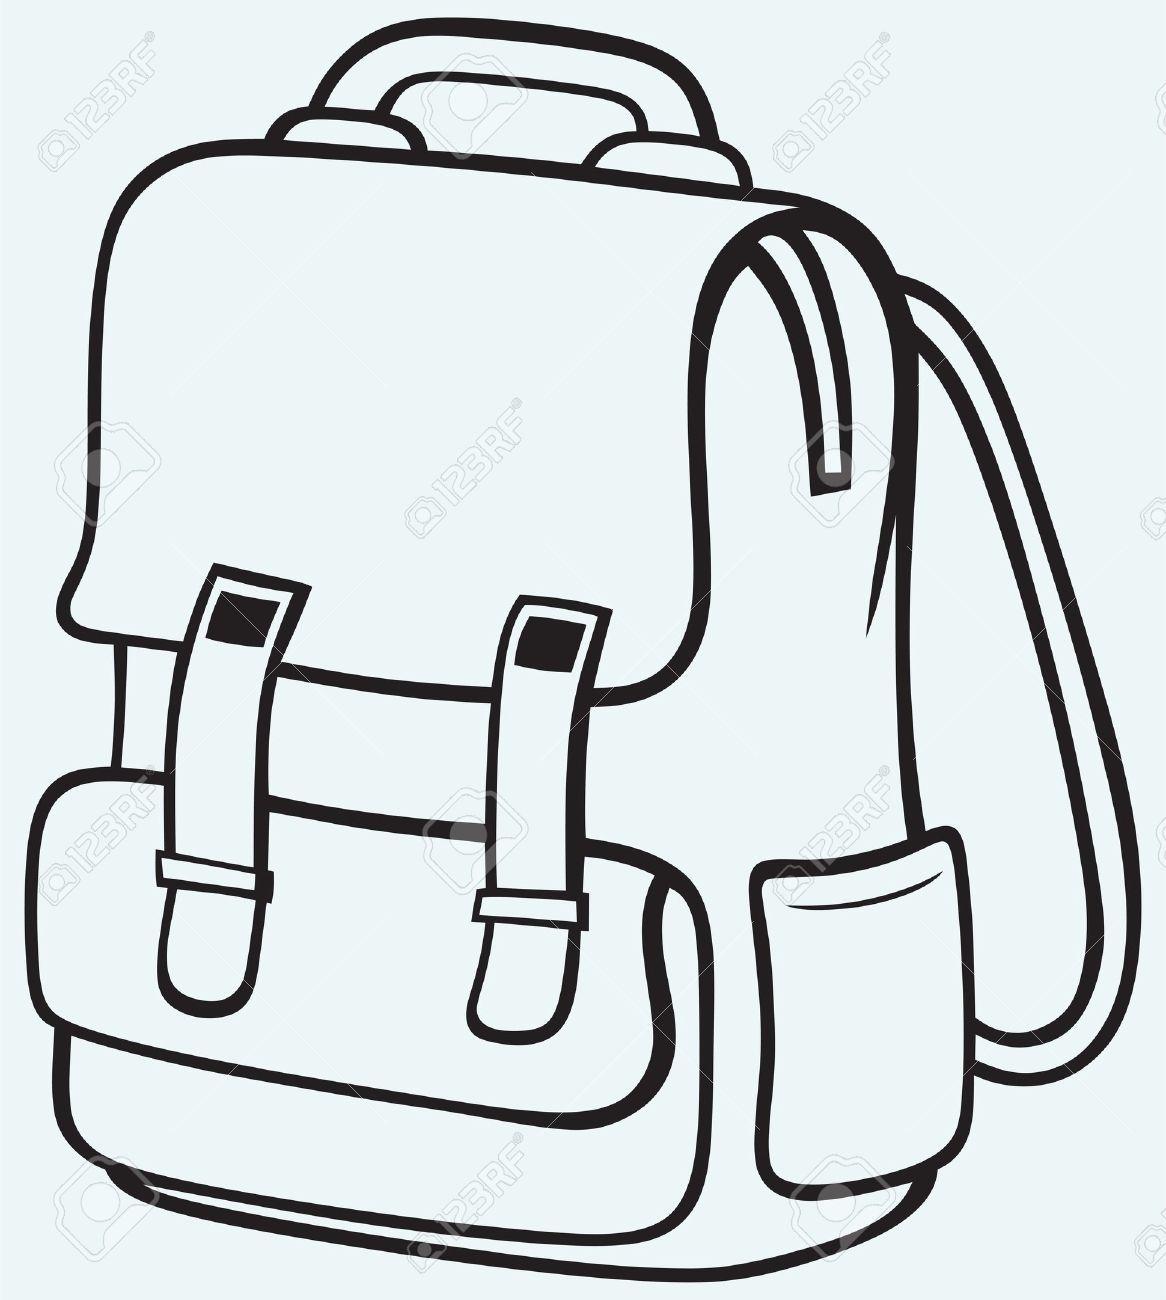 Bag clipart black and white 2 » Clipart Portal.